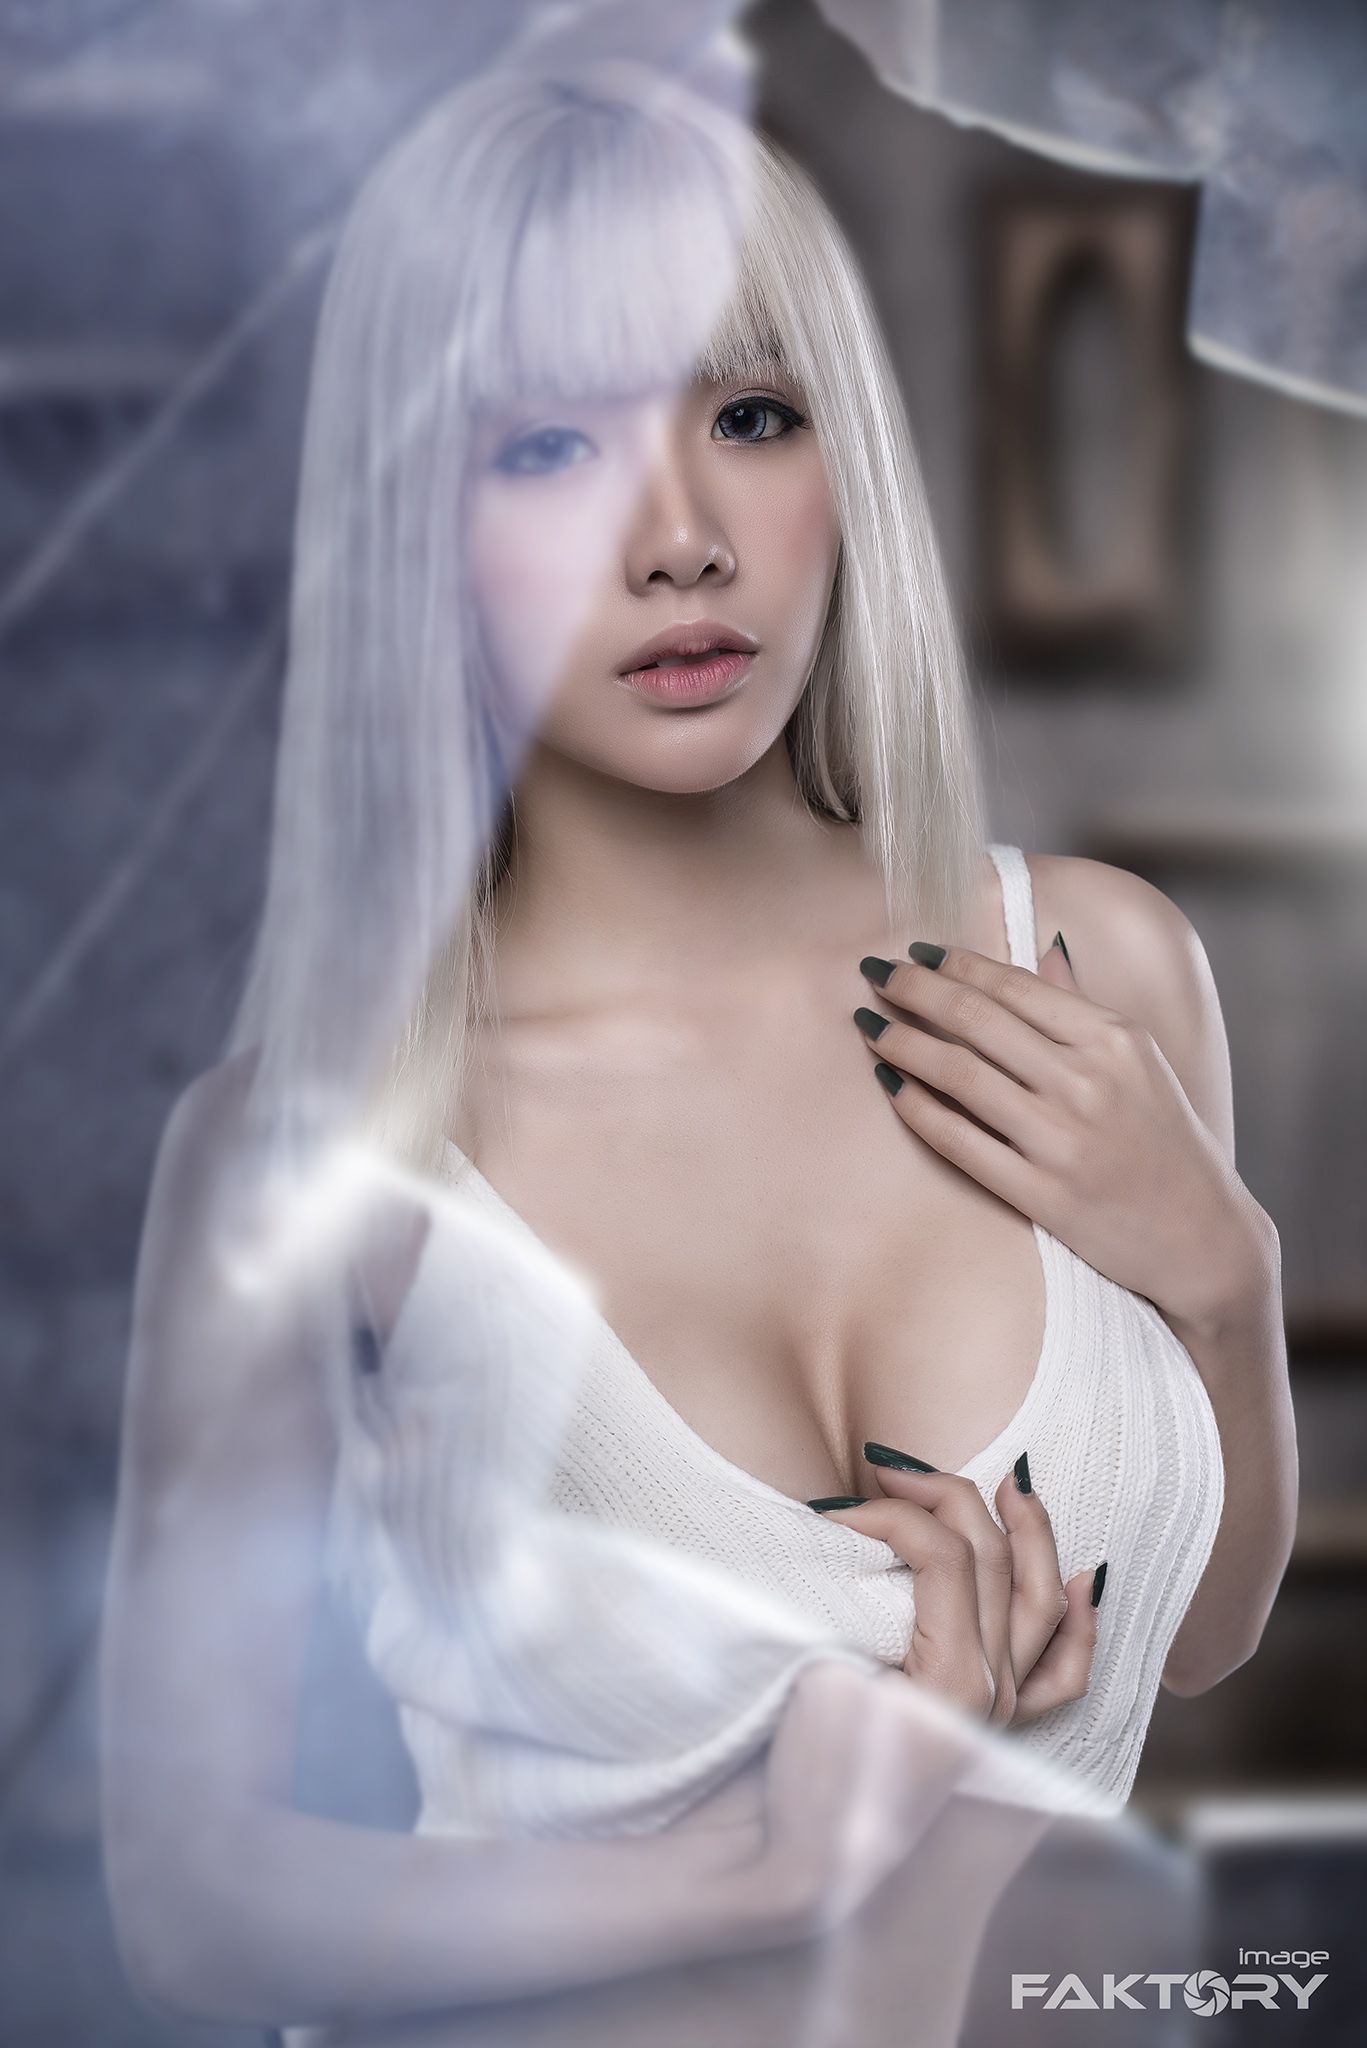 Thai girl breast